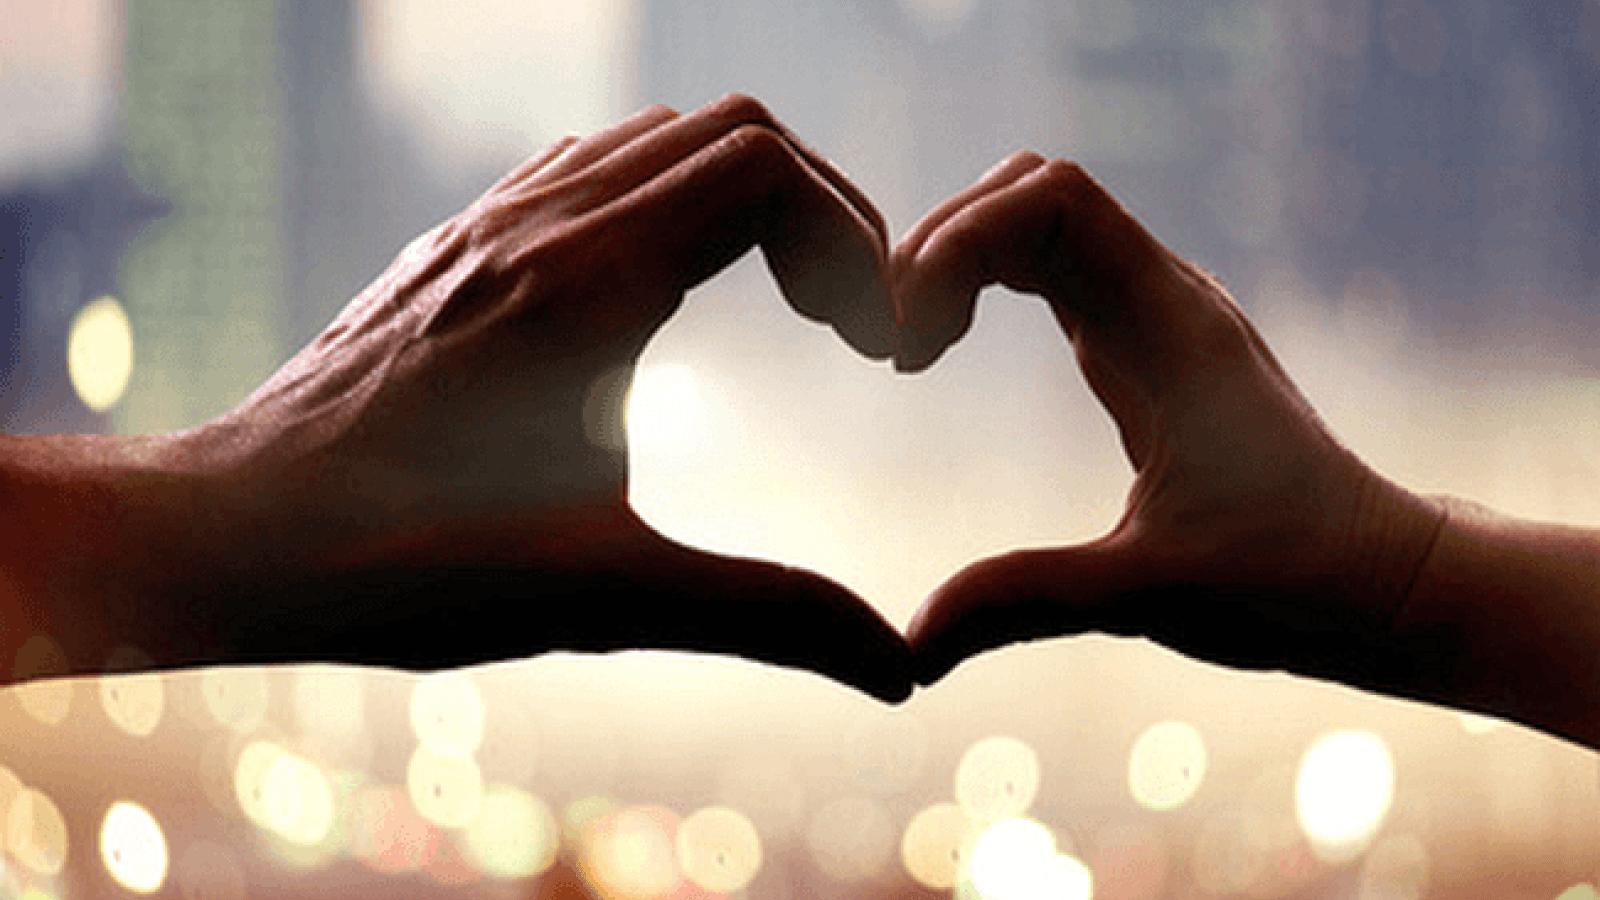 Sezz Saint Tropez, Honeymoon and Sezz'n Romance offers